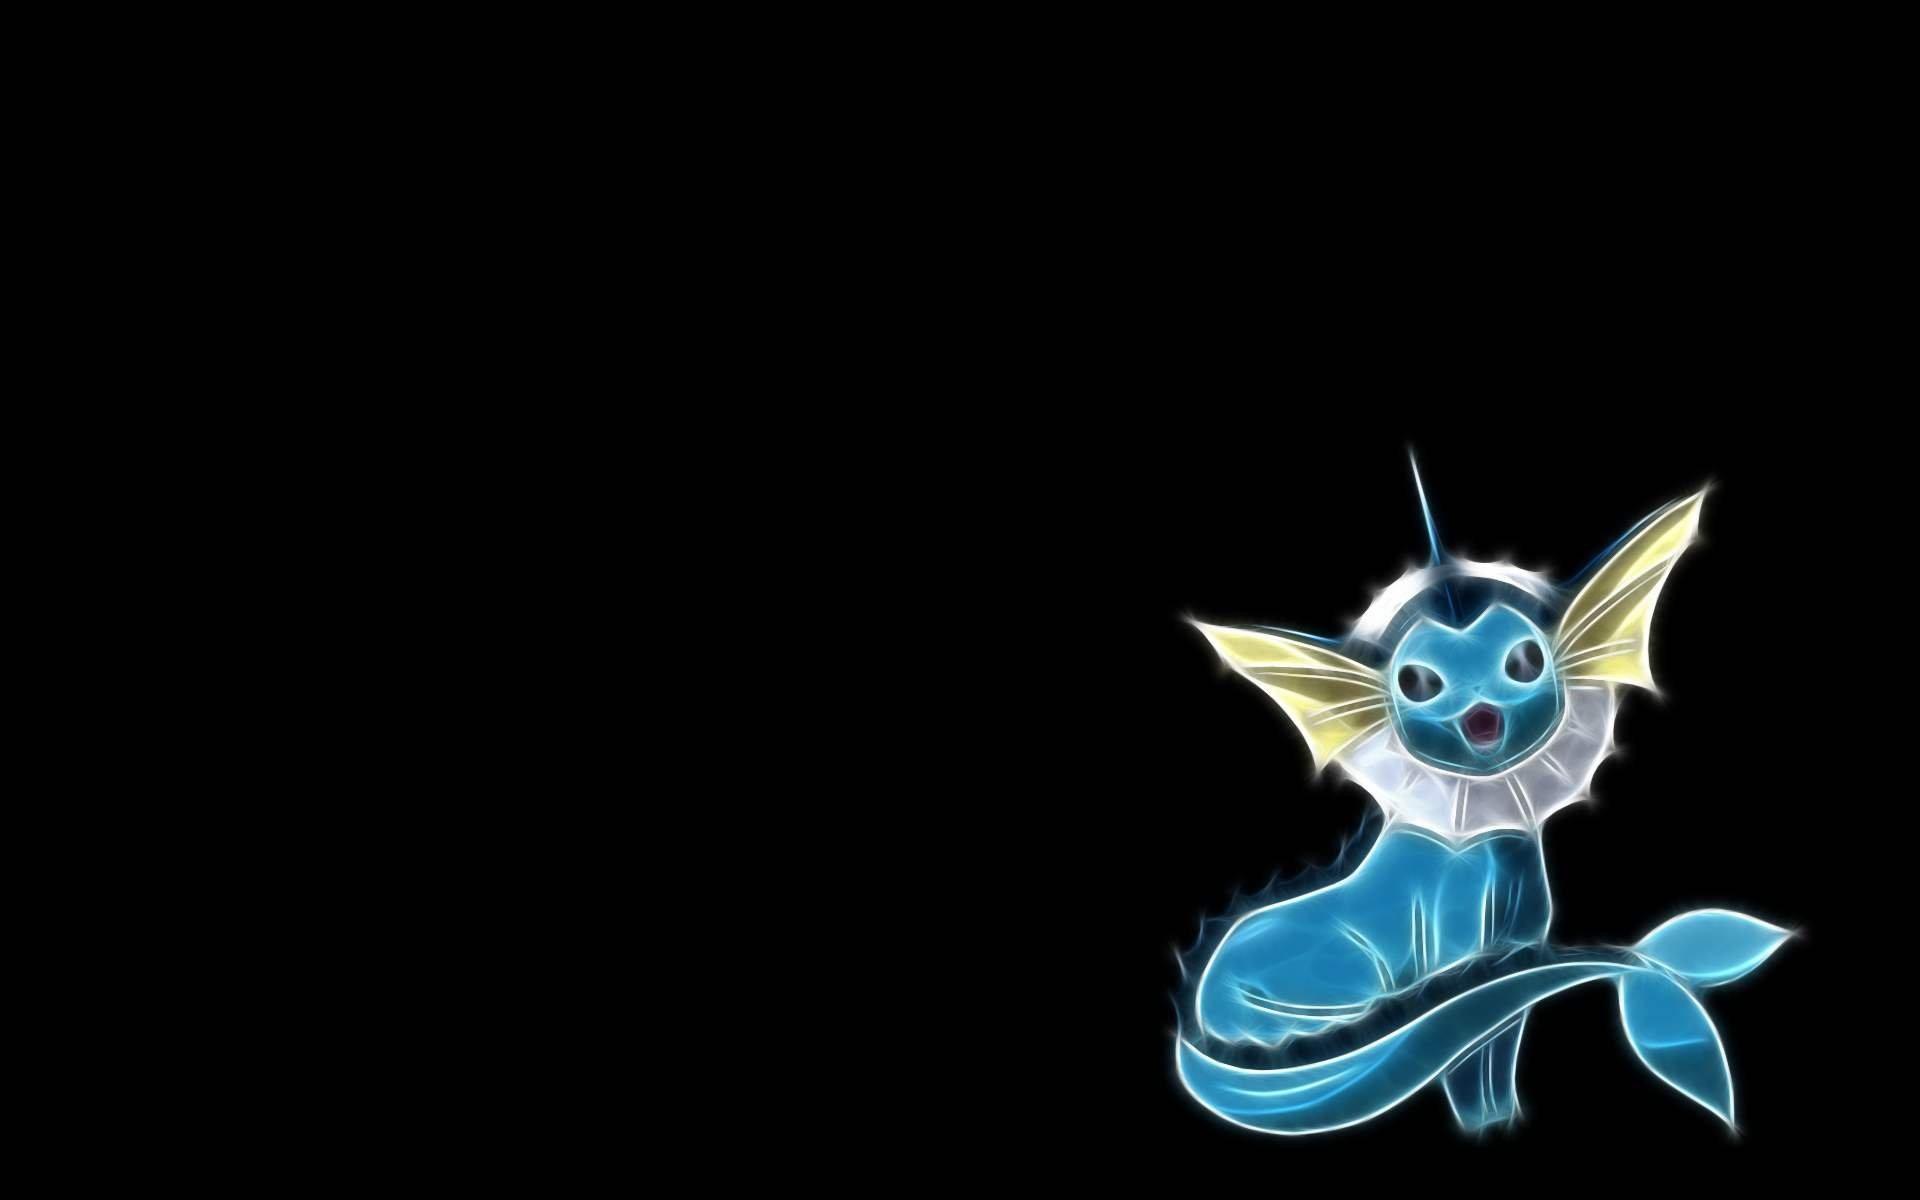 Vaporeon WallpaperVideo Game Pokémon Vaporeon Pokémon Eeveelutions Wallpaper